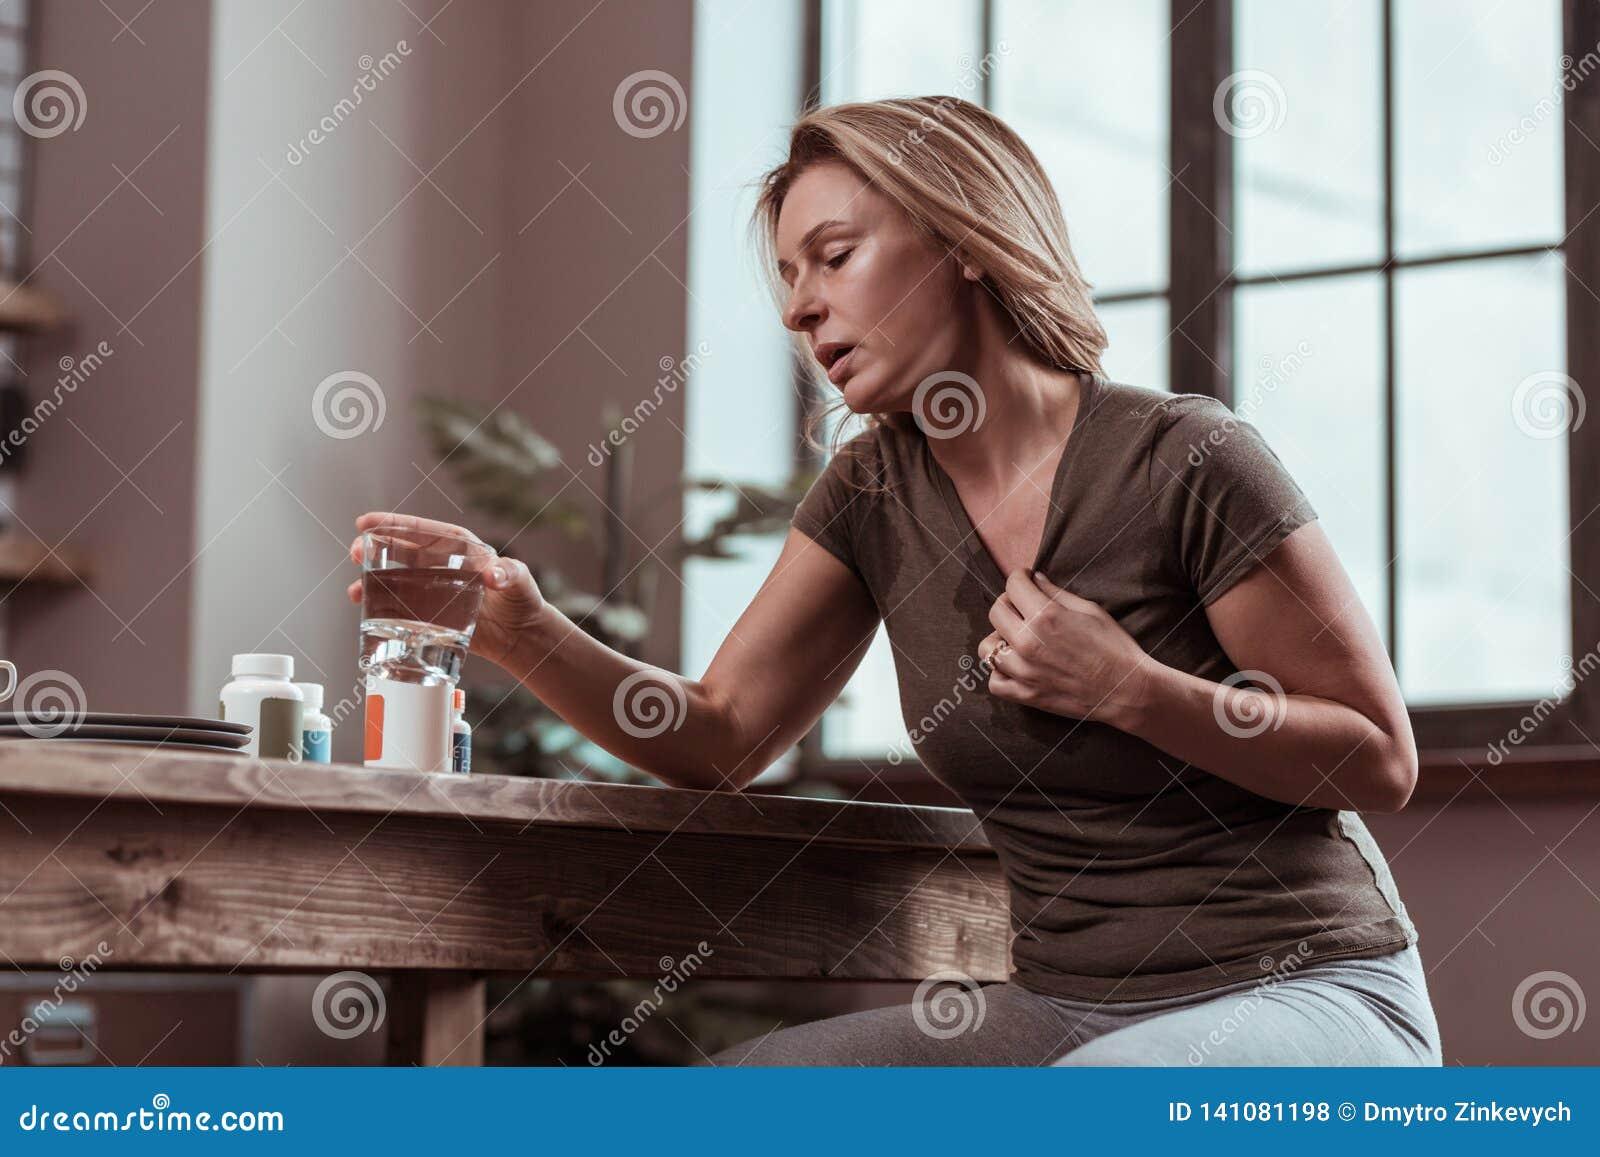 Blonde woman suffering from panic attacks taking pills